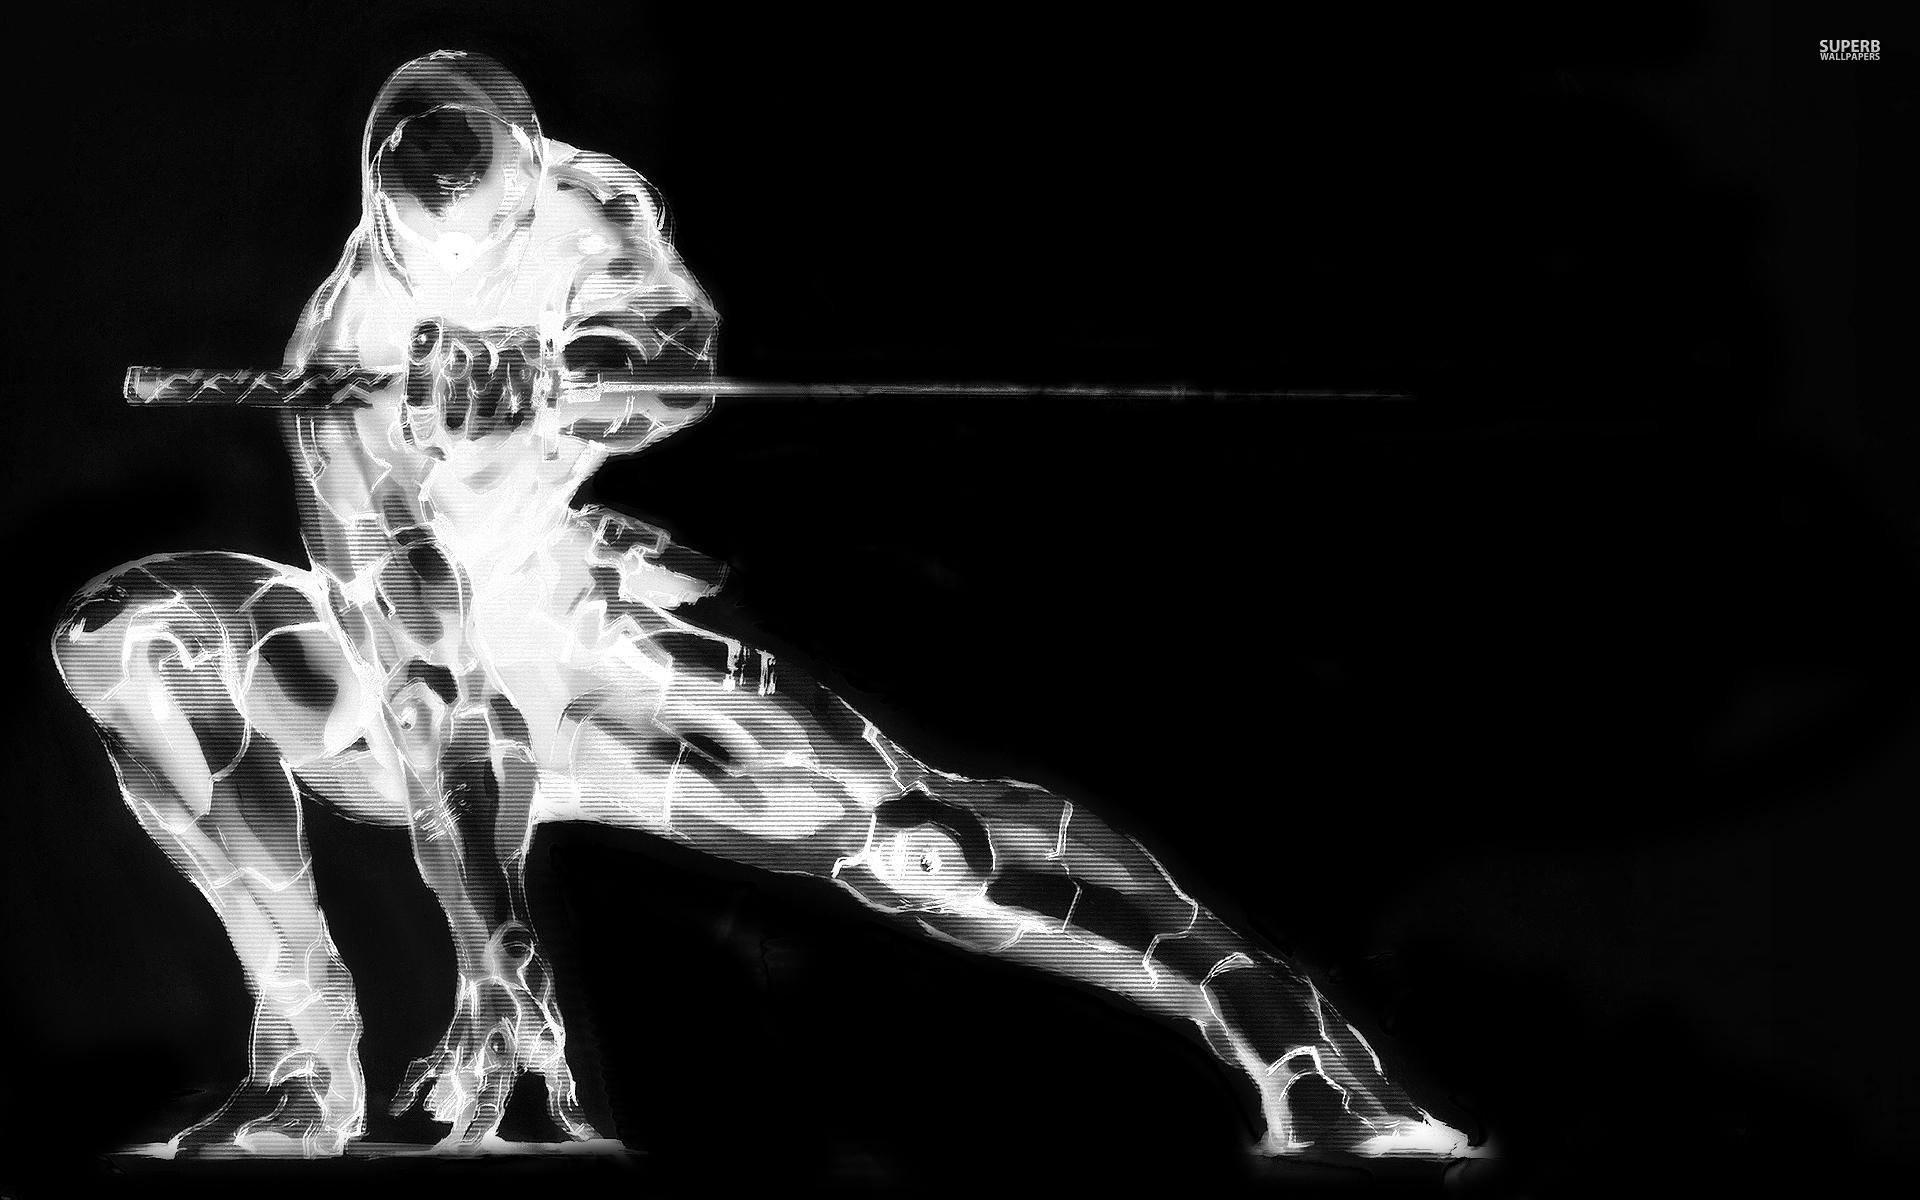 Gray Fox – Metal Gear Solid 854019 …